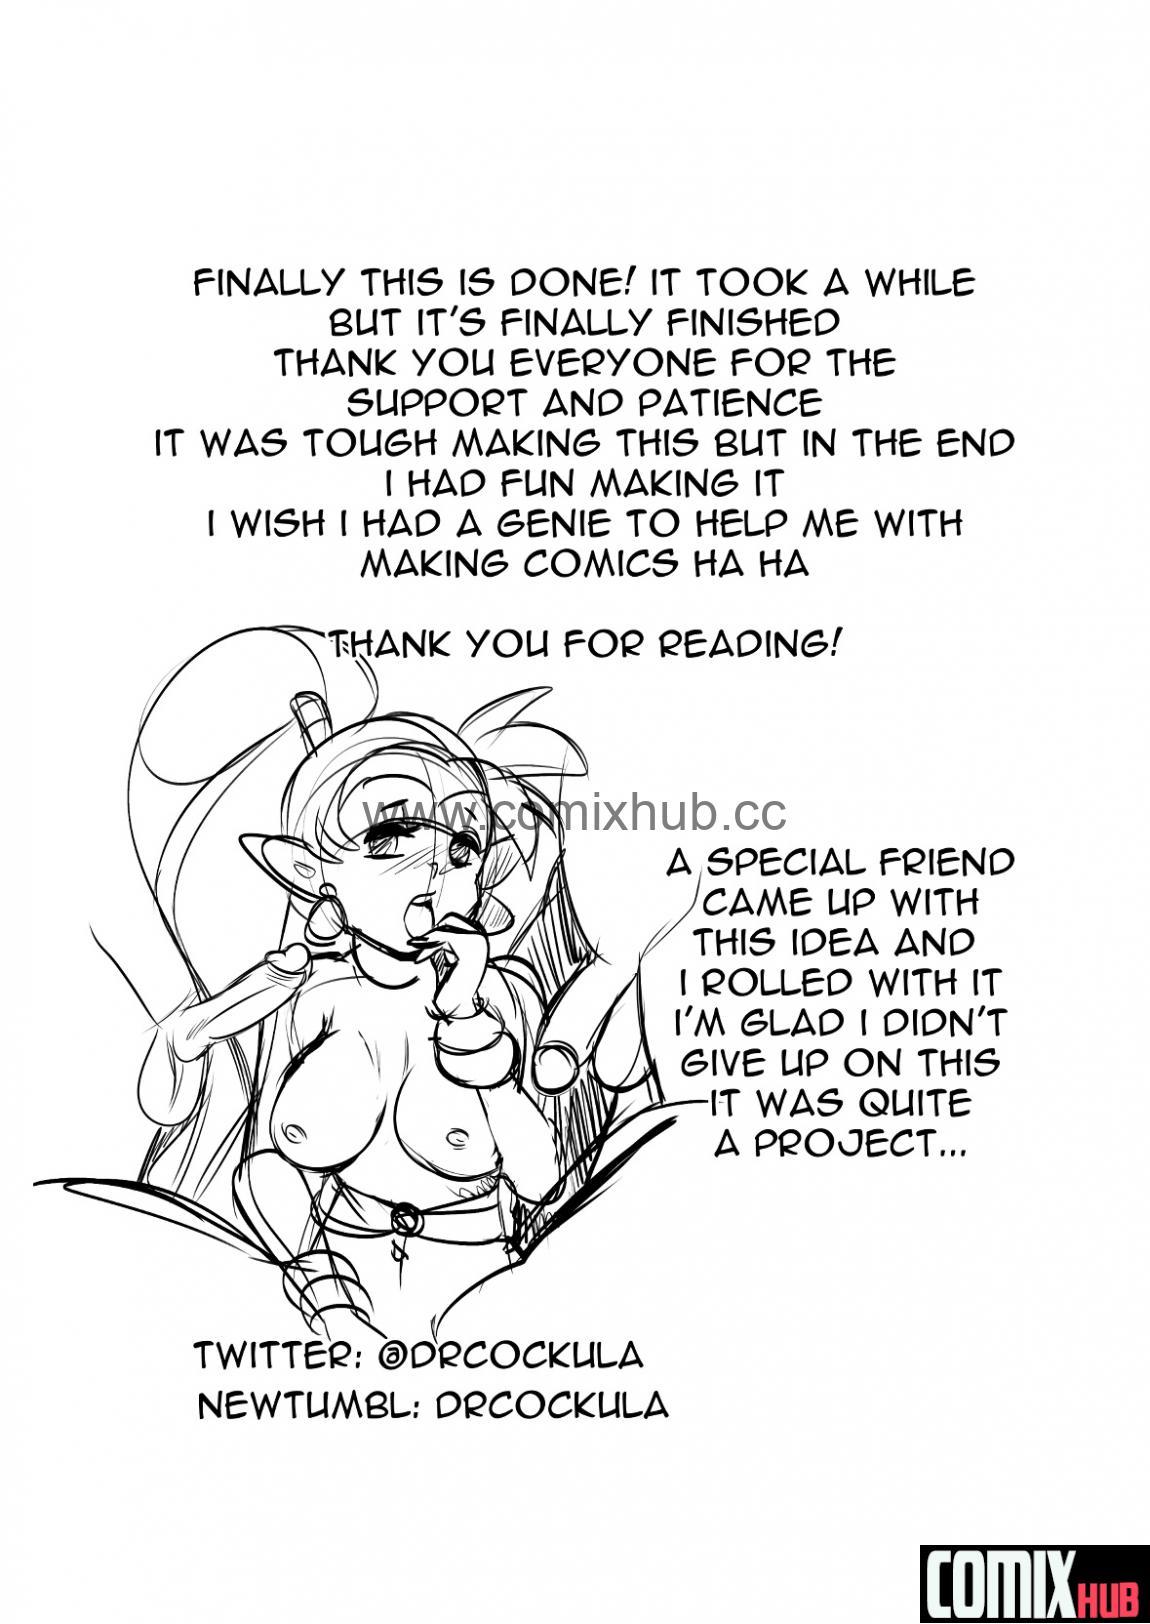 Порно комикс, Шантэ и три желания Порно комиксы, Анал, Групповой секс, Двойное проникновение